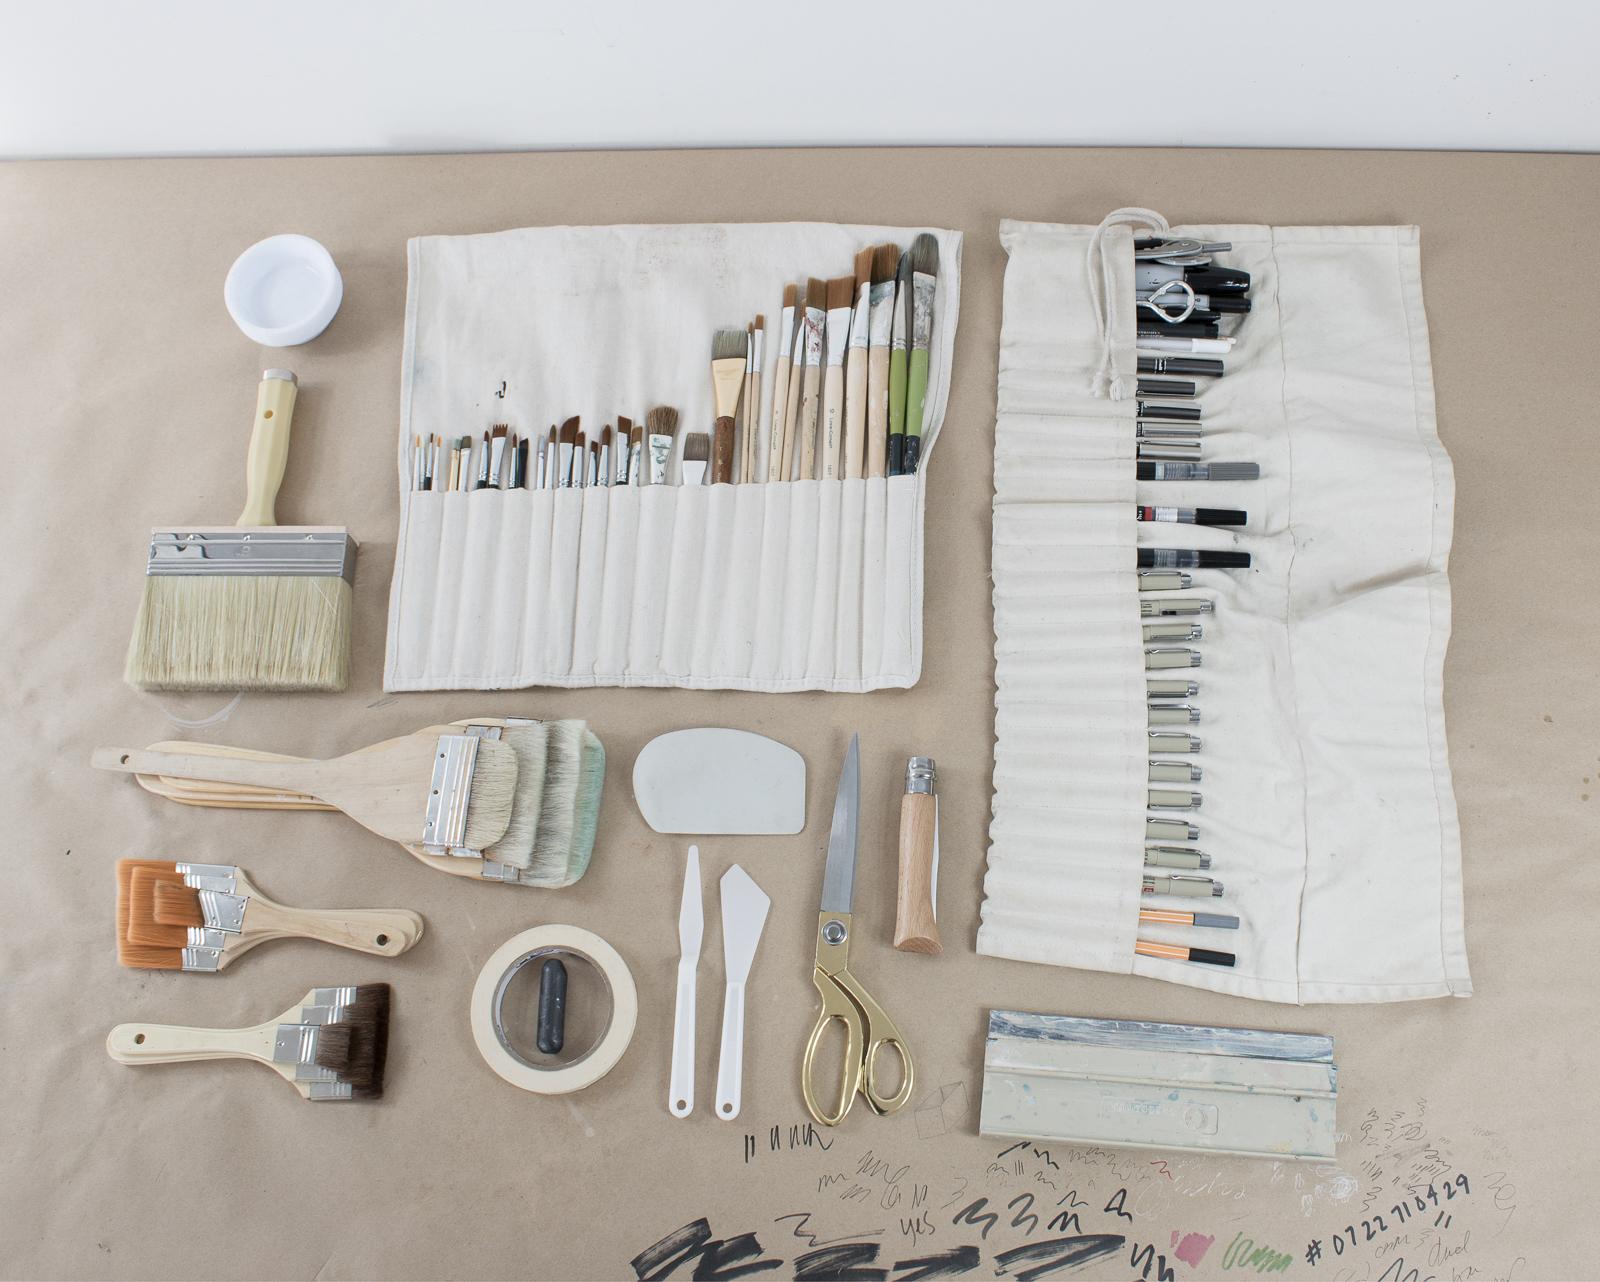 Travel Kit - how I pack for making art on the road